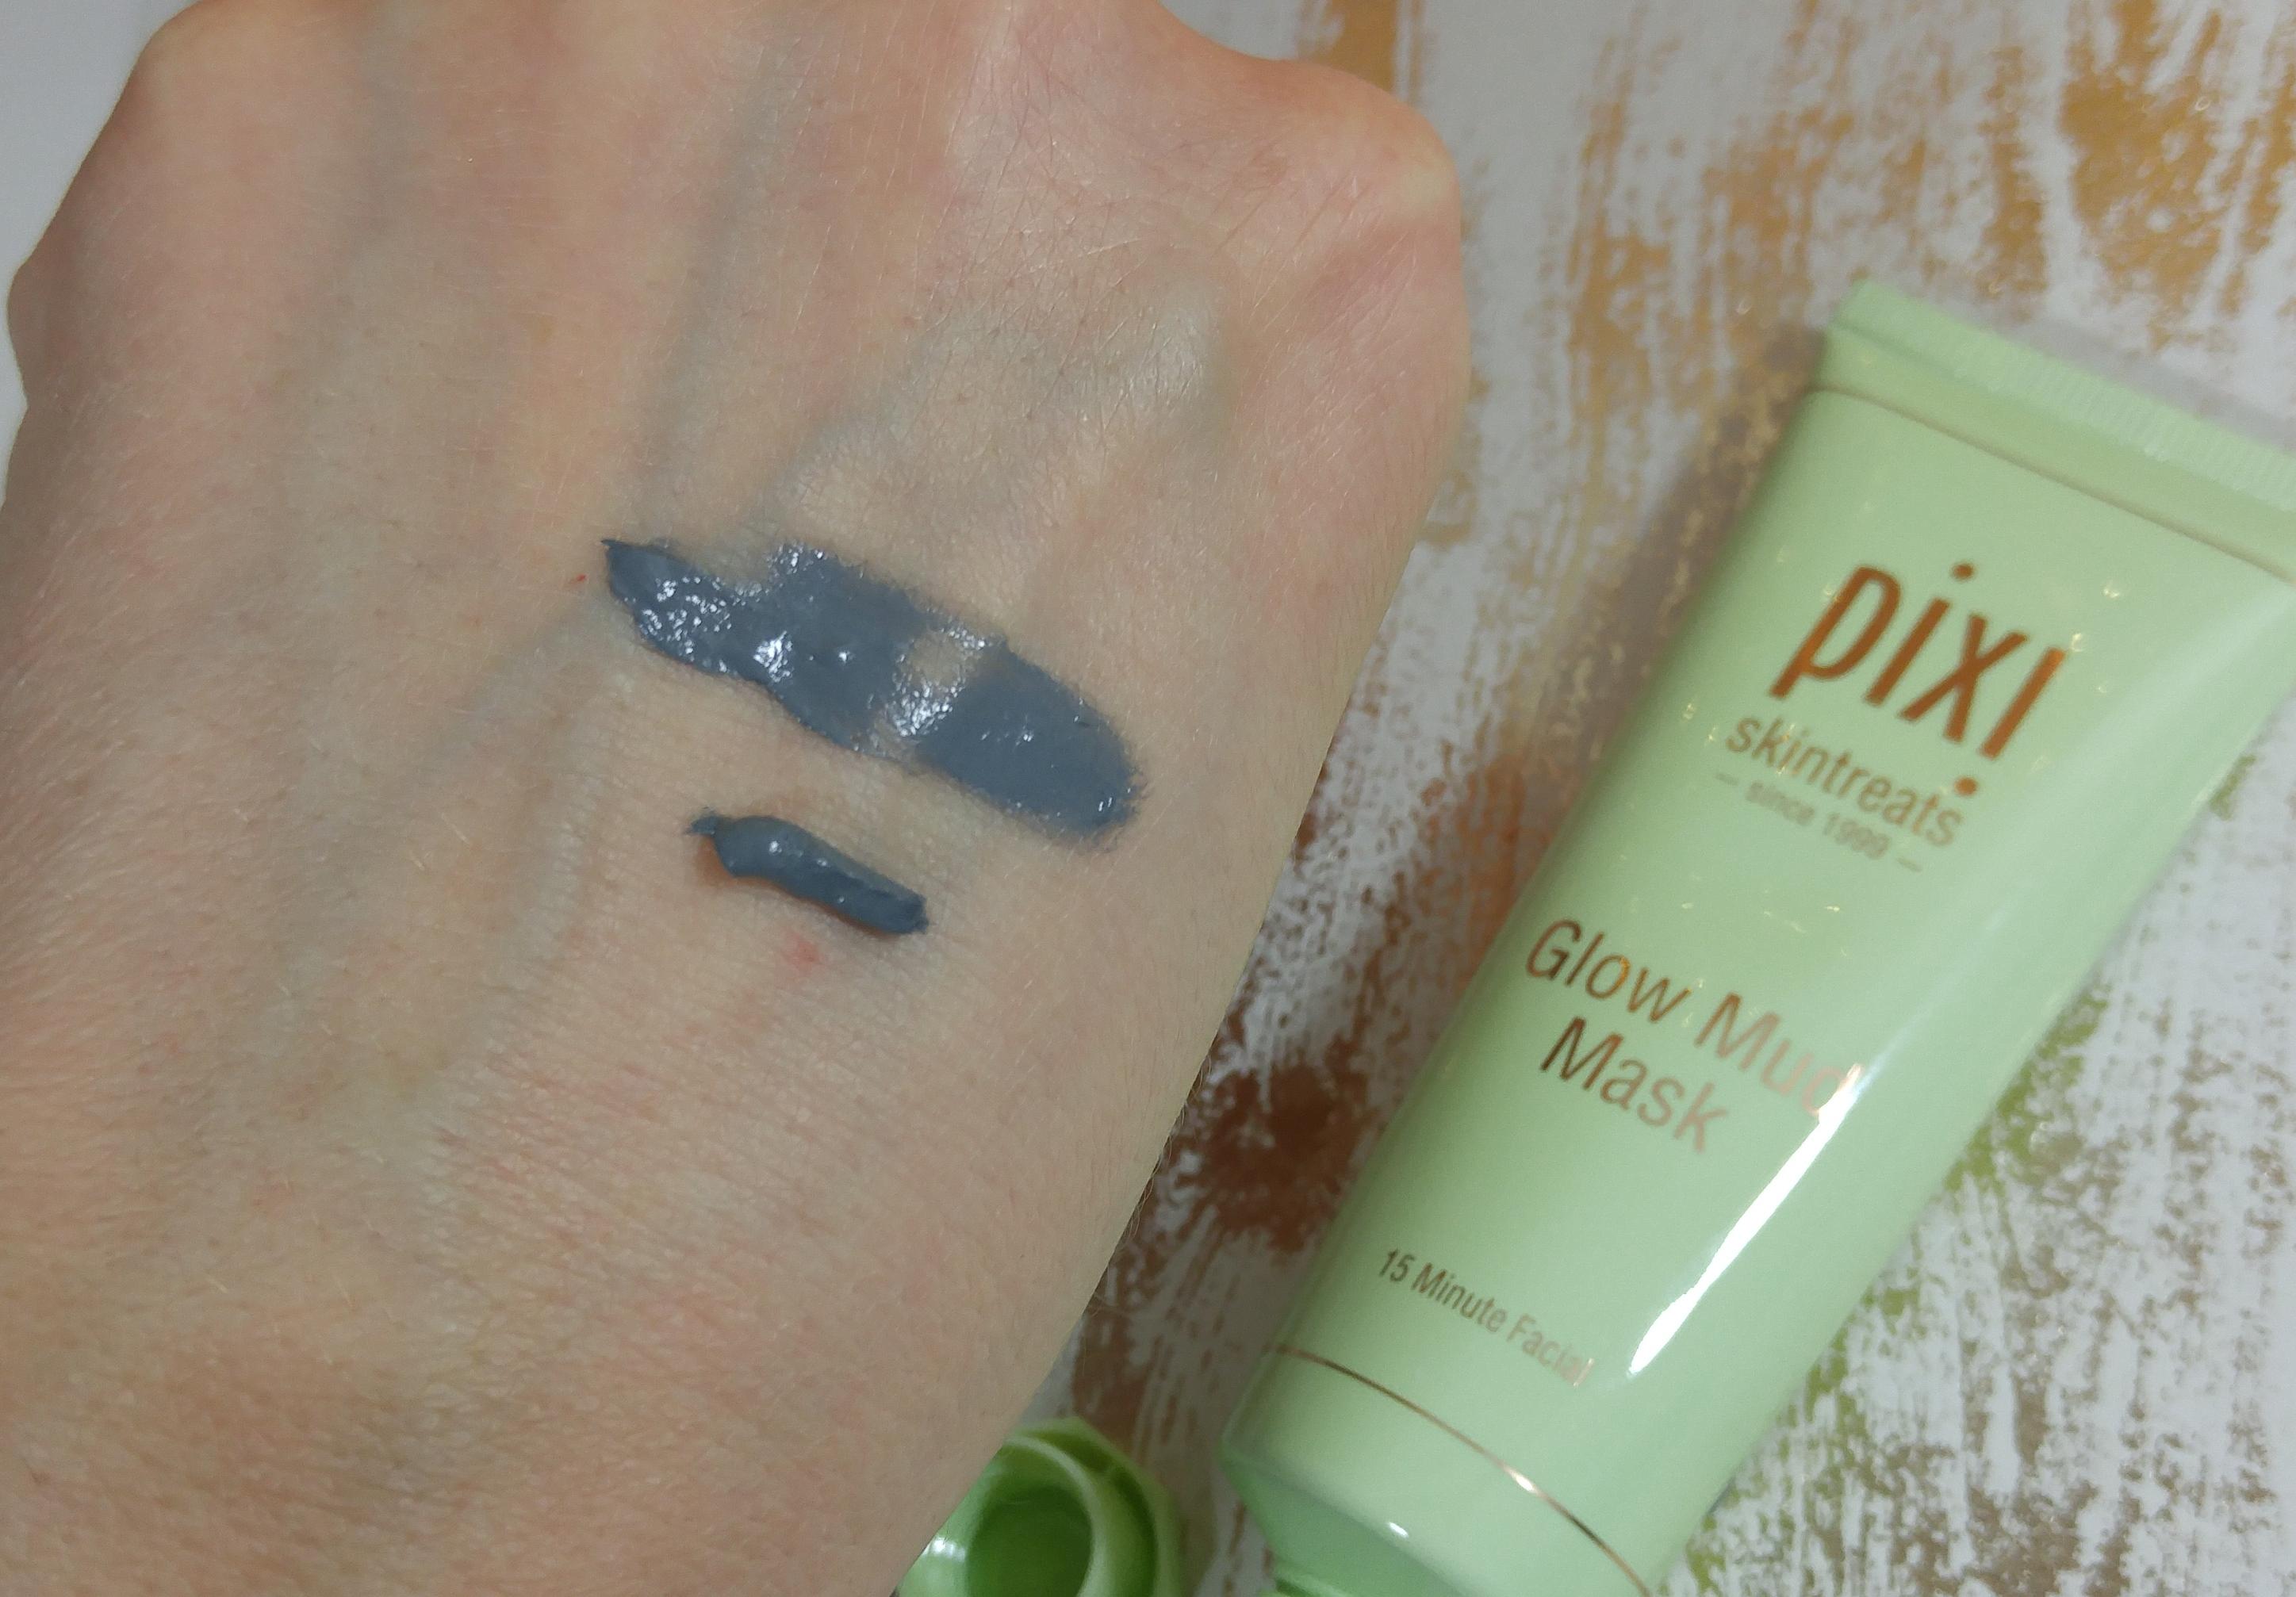 Pixi Glow Mud Mask Swatch